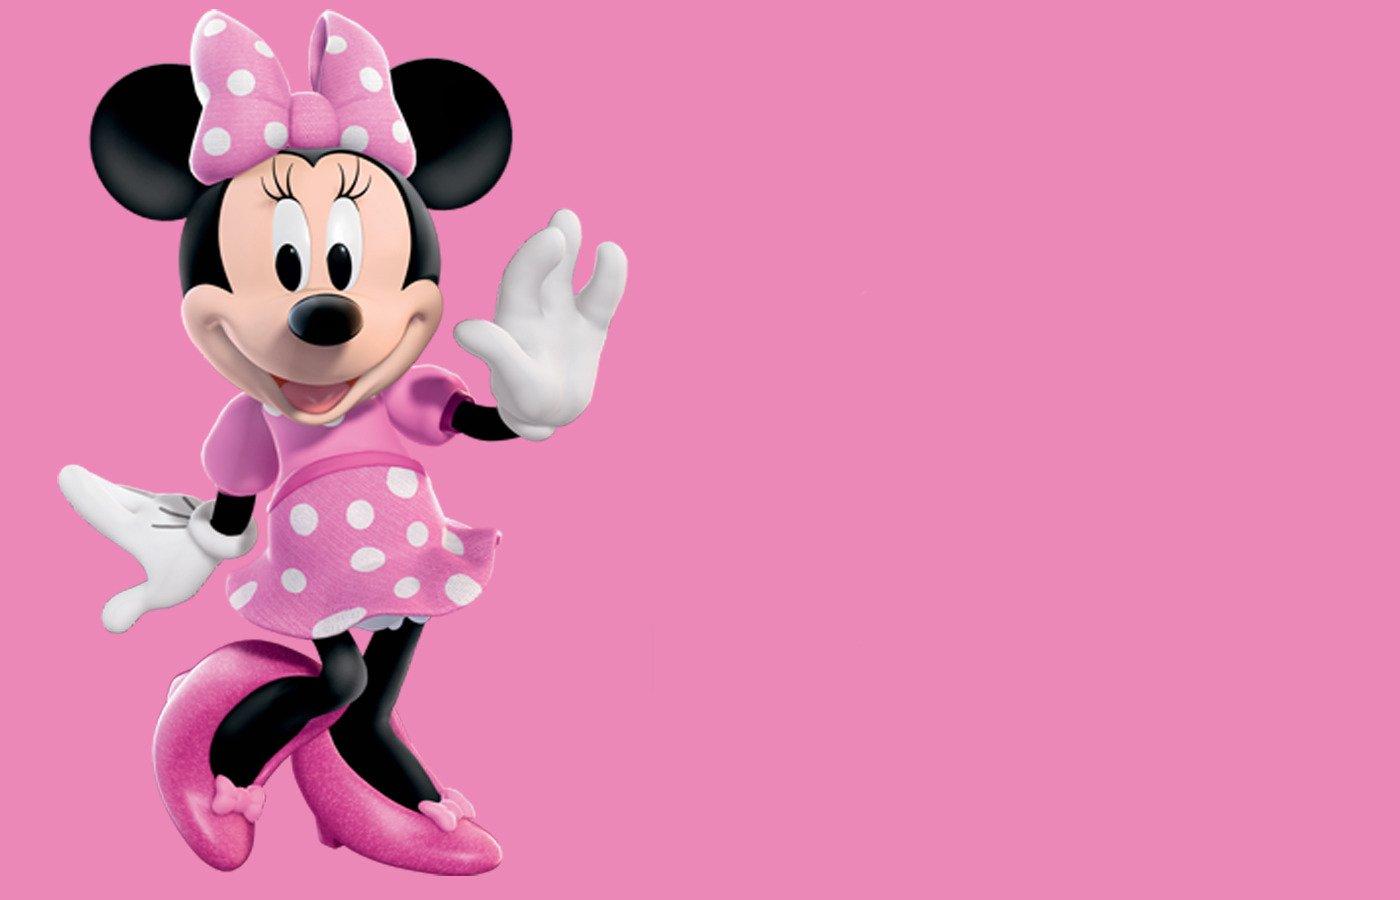 Minnie Mouse Desktop Wallpaper - WallpaperSafari